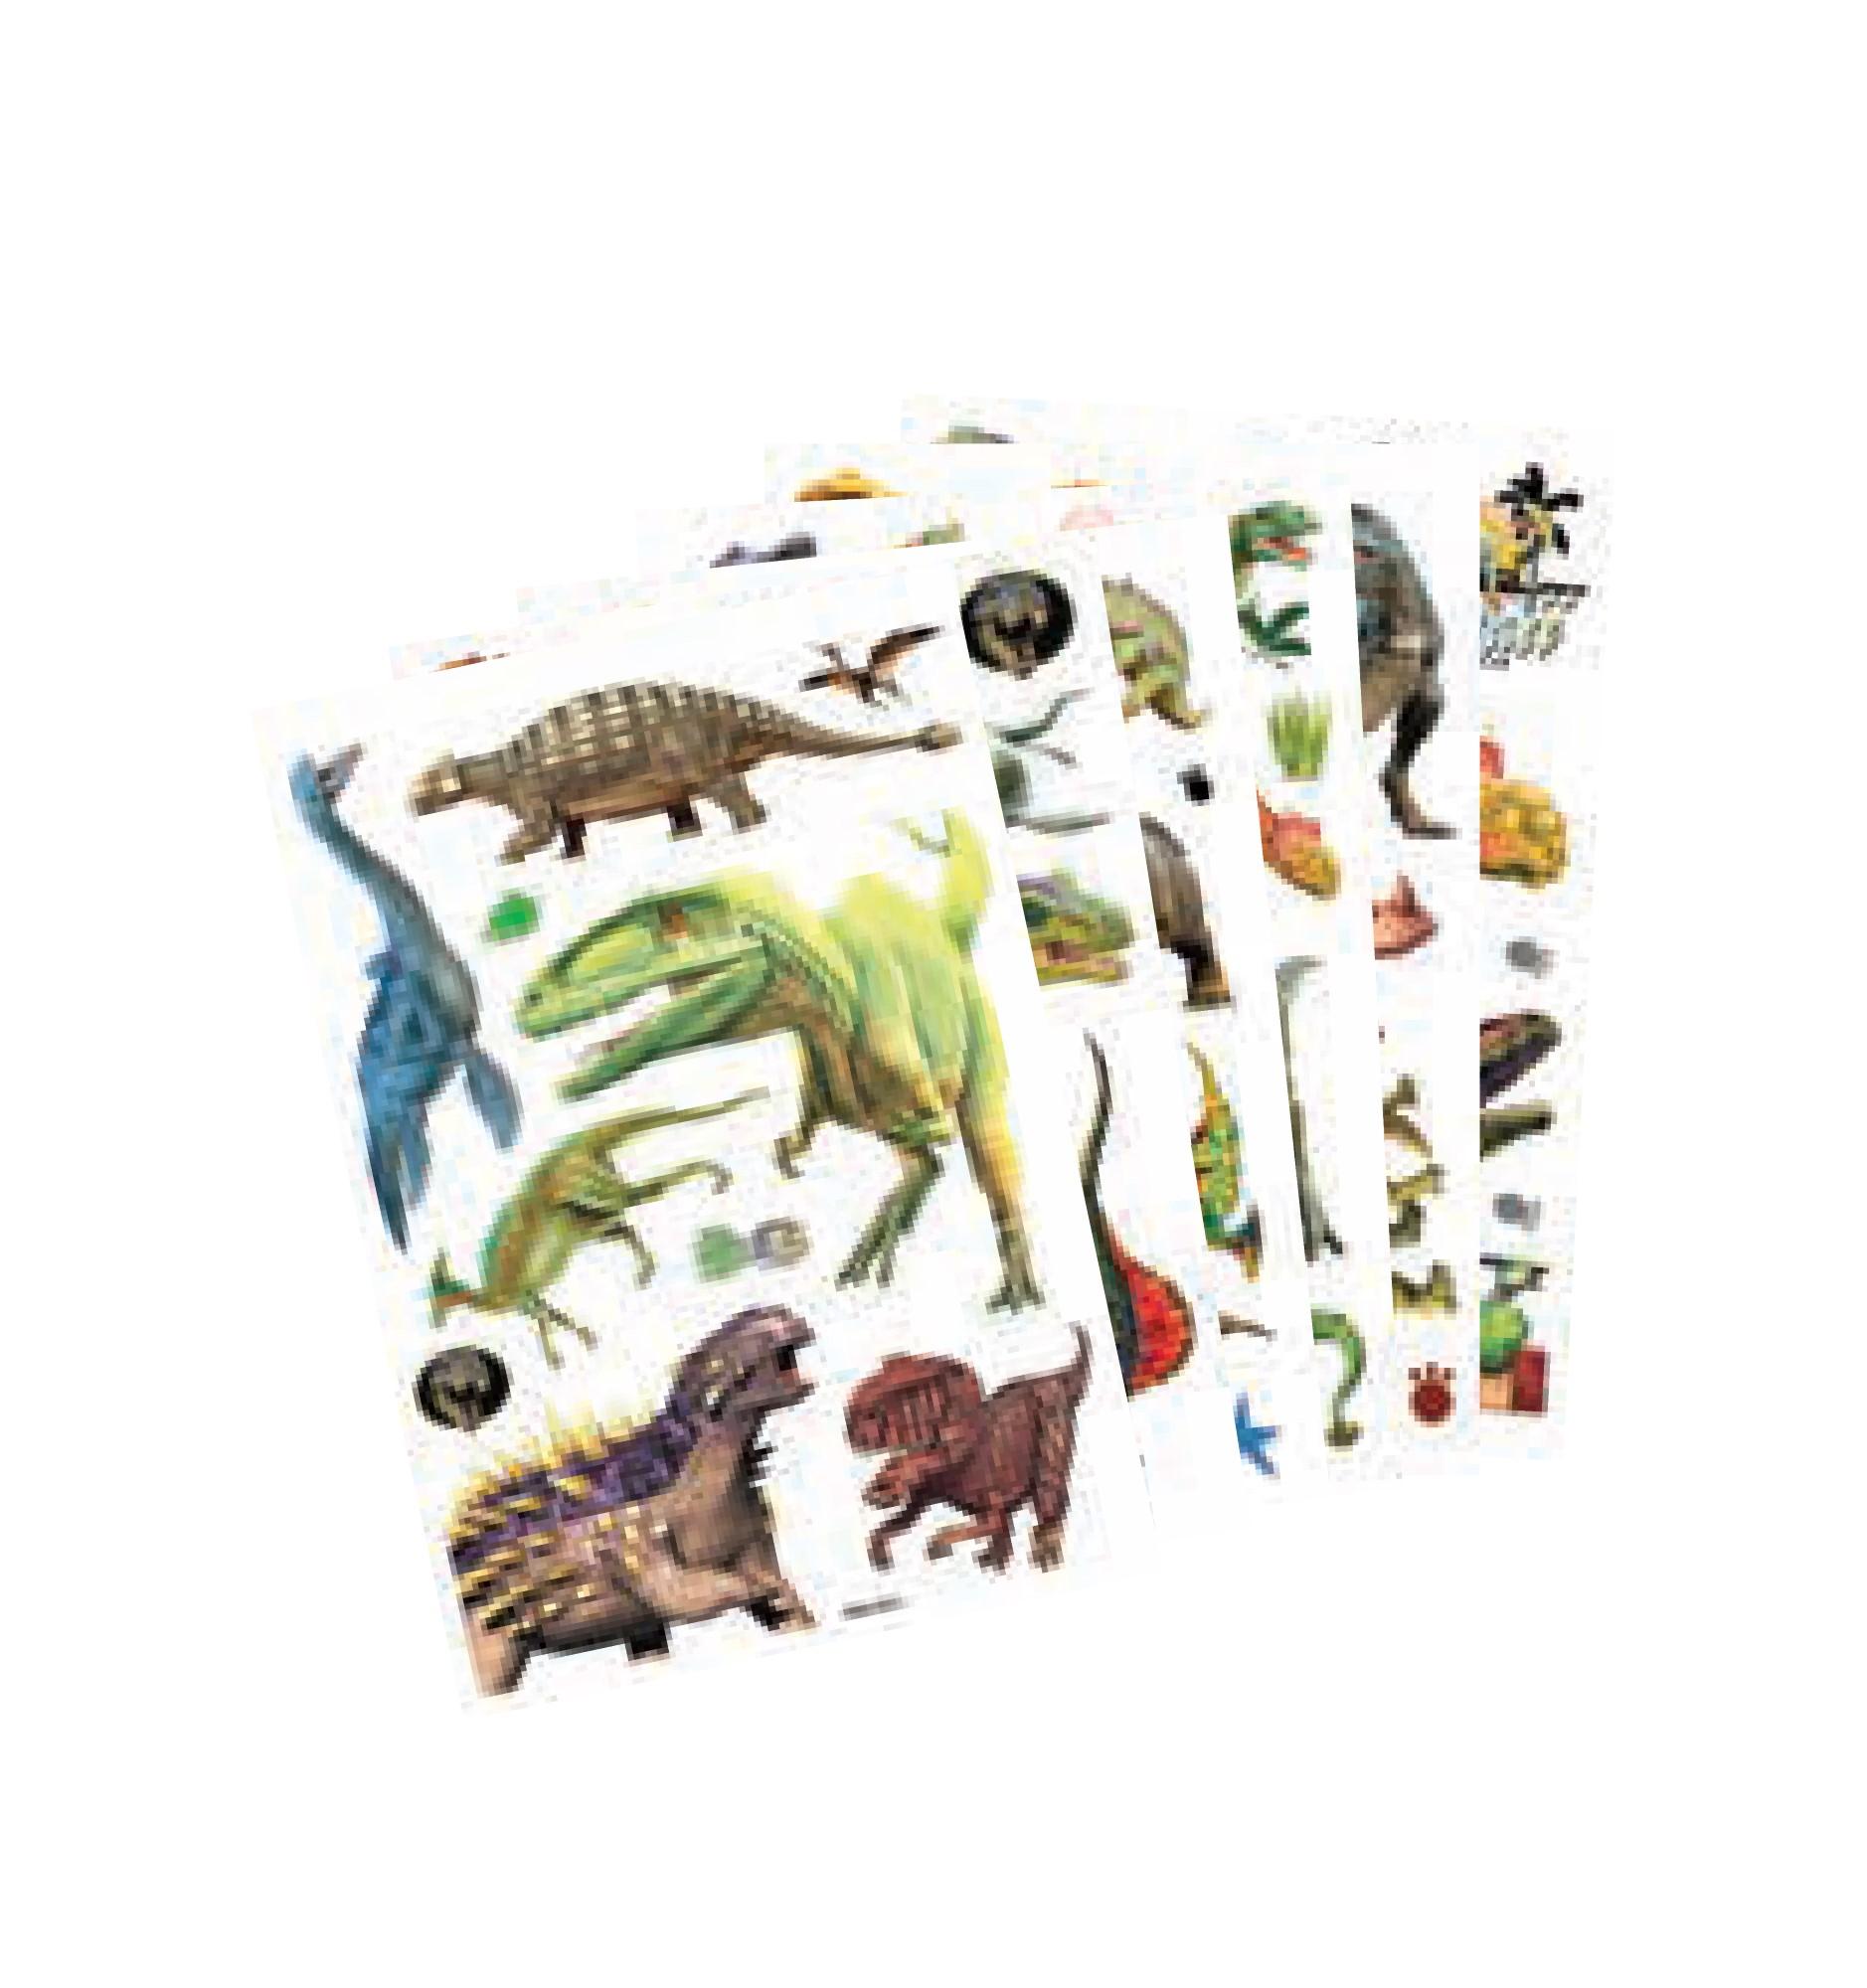 Adesivos 3D Dinossauros  Decorativos Grande-2571